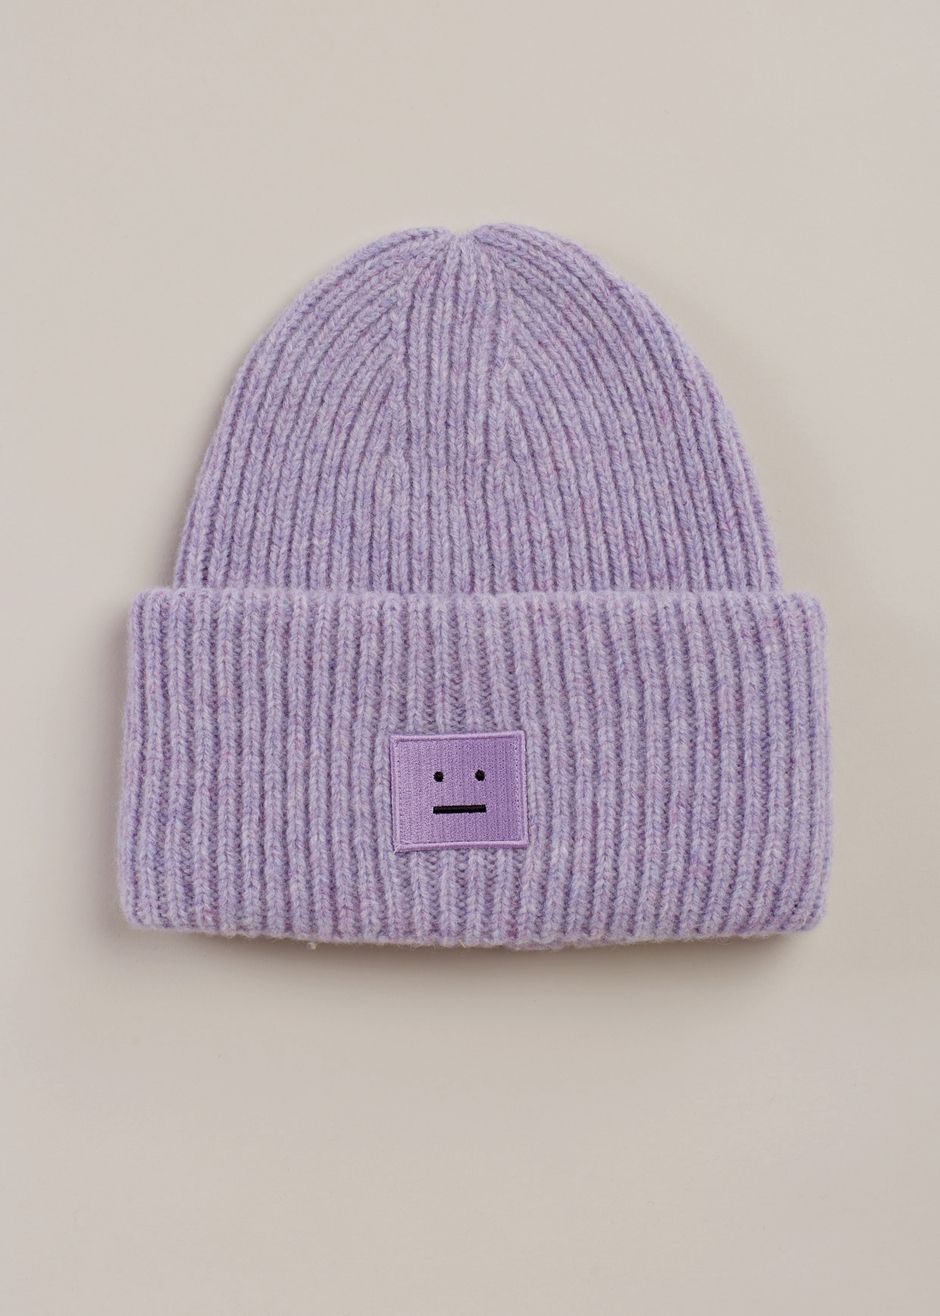 b5122801938ea Acne Studios Pansy Shet Hat (Lavender)